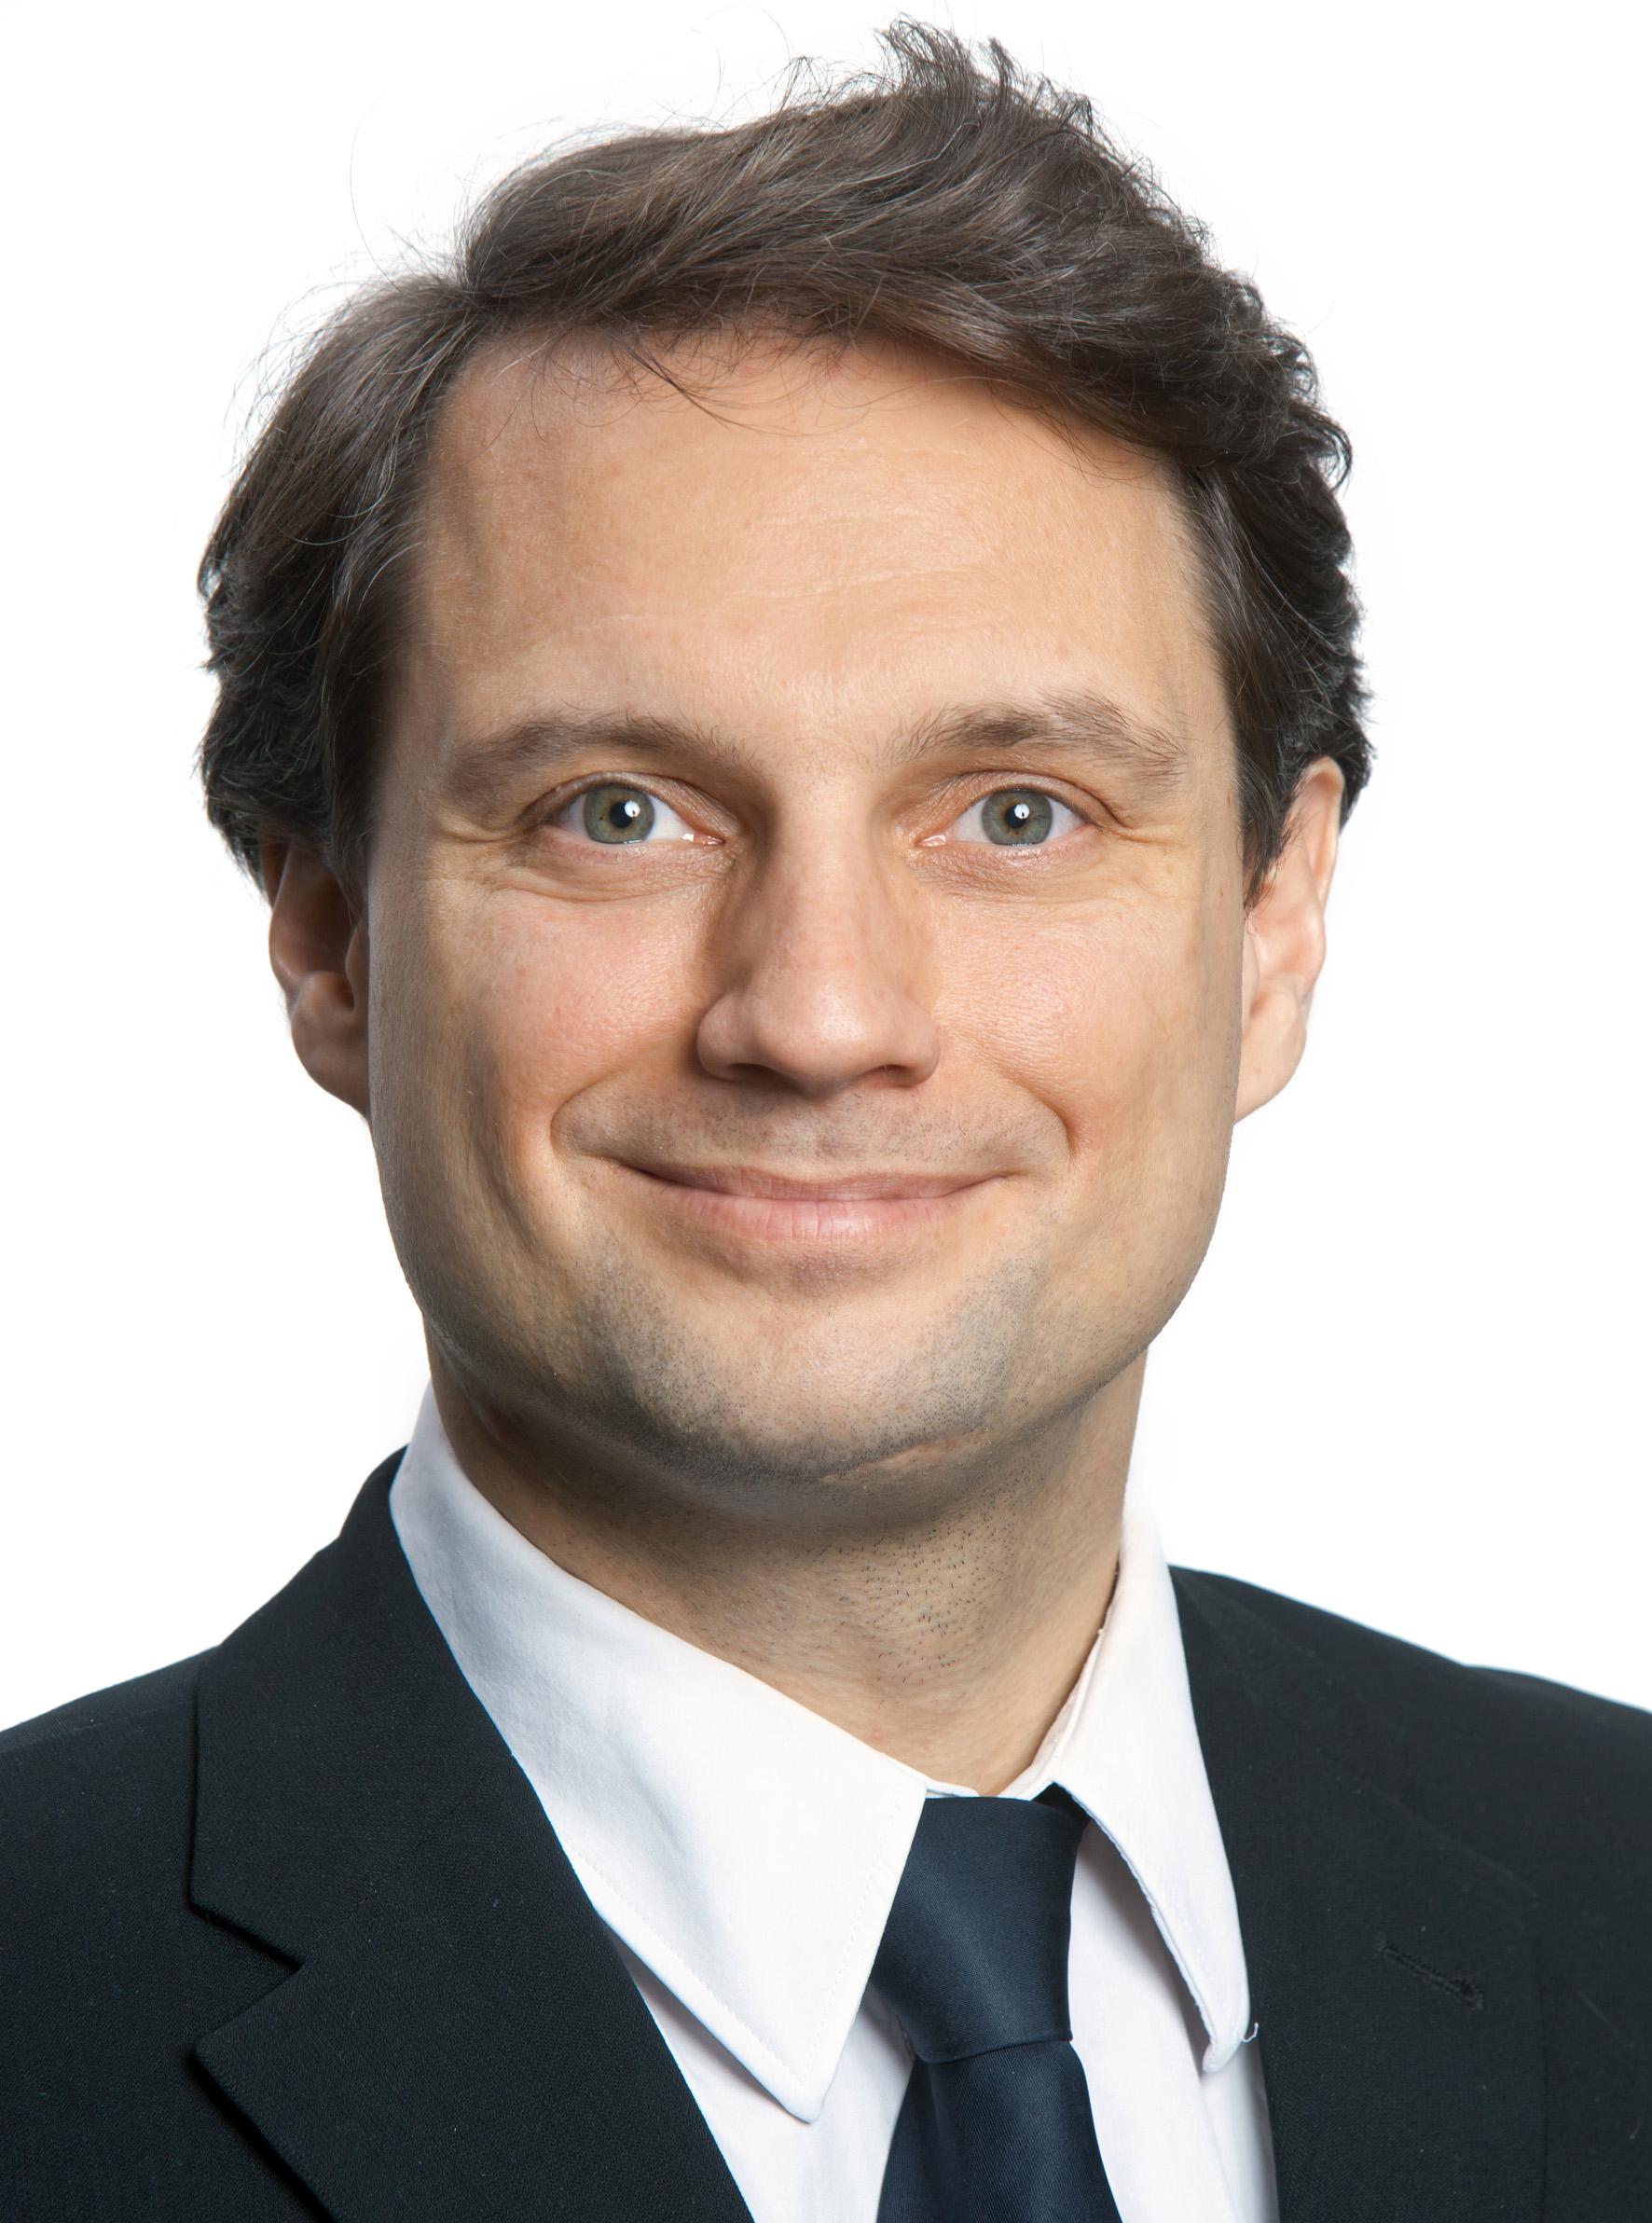 P. Palensky